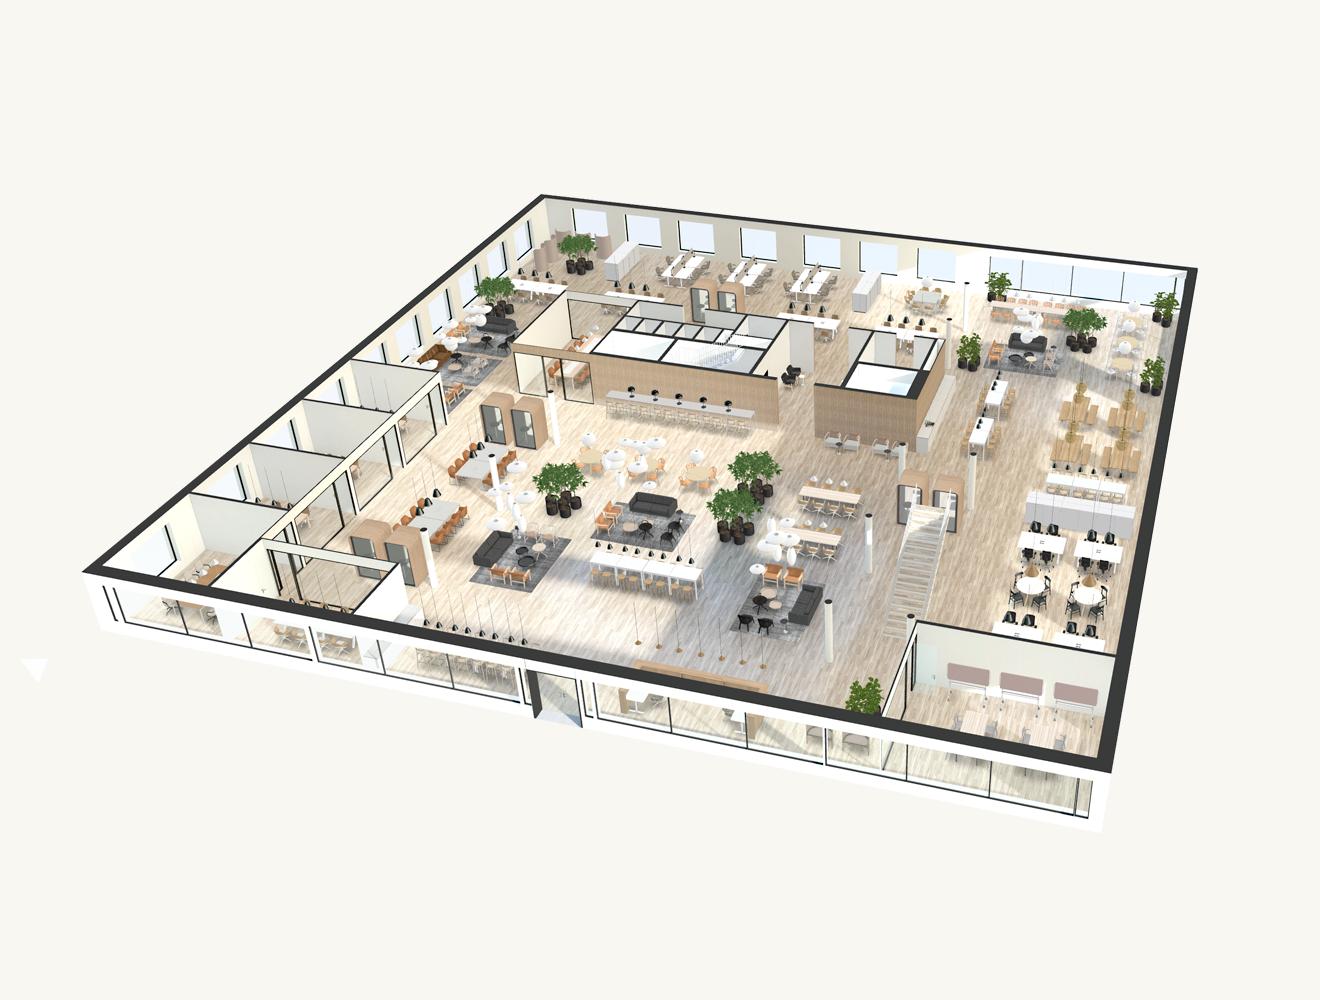 3d_office_plan_1.png